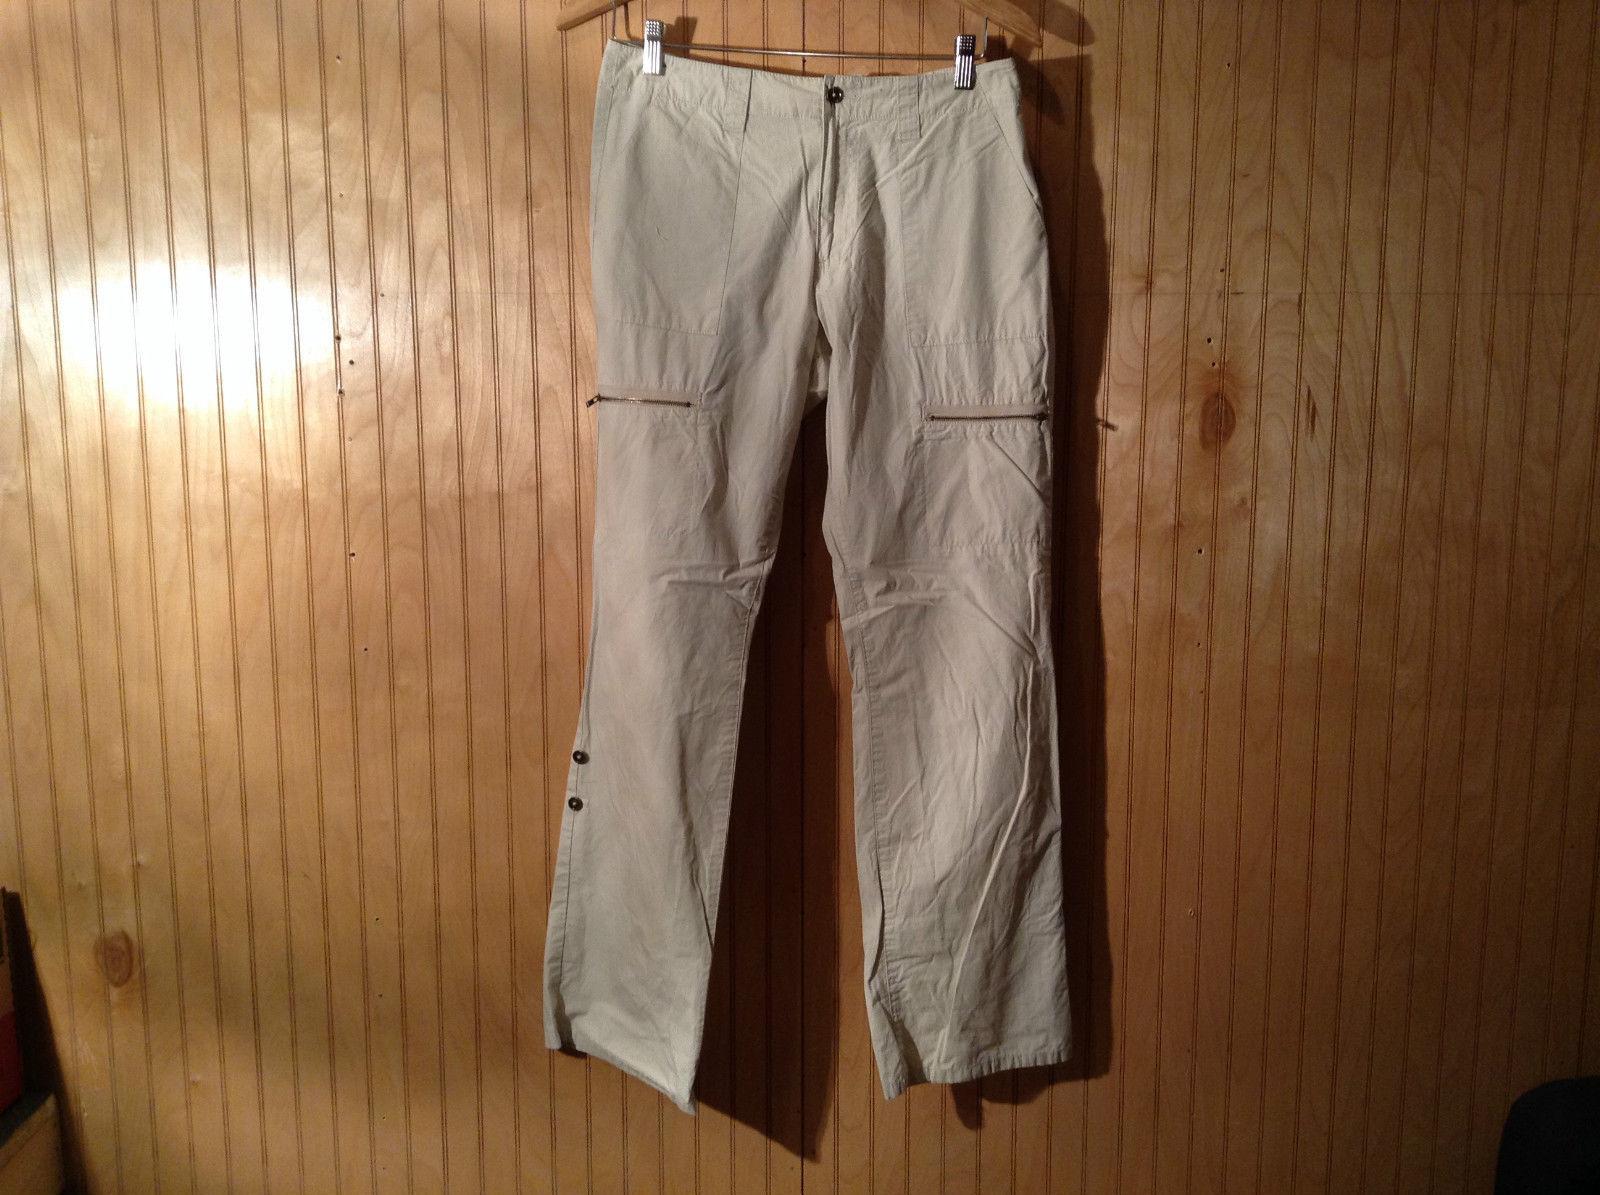 Tan Calvin Klein Casual Pants 2 Side Pockets 2 Back Pockets 2 Leg Pockets Size 6